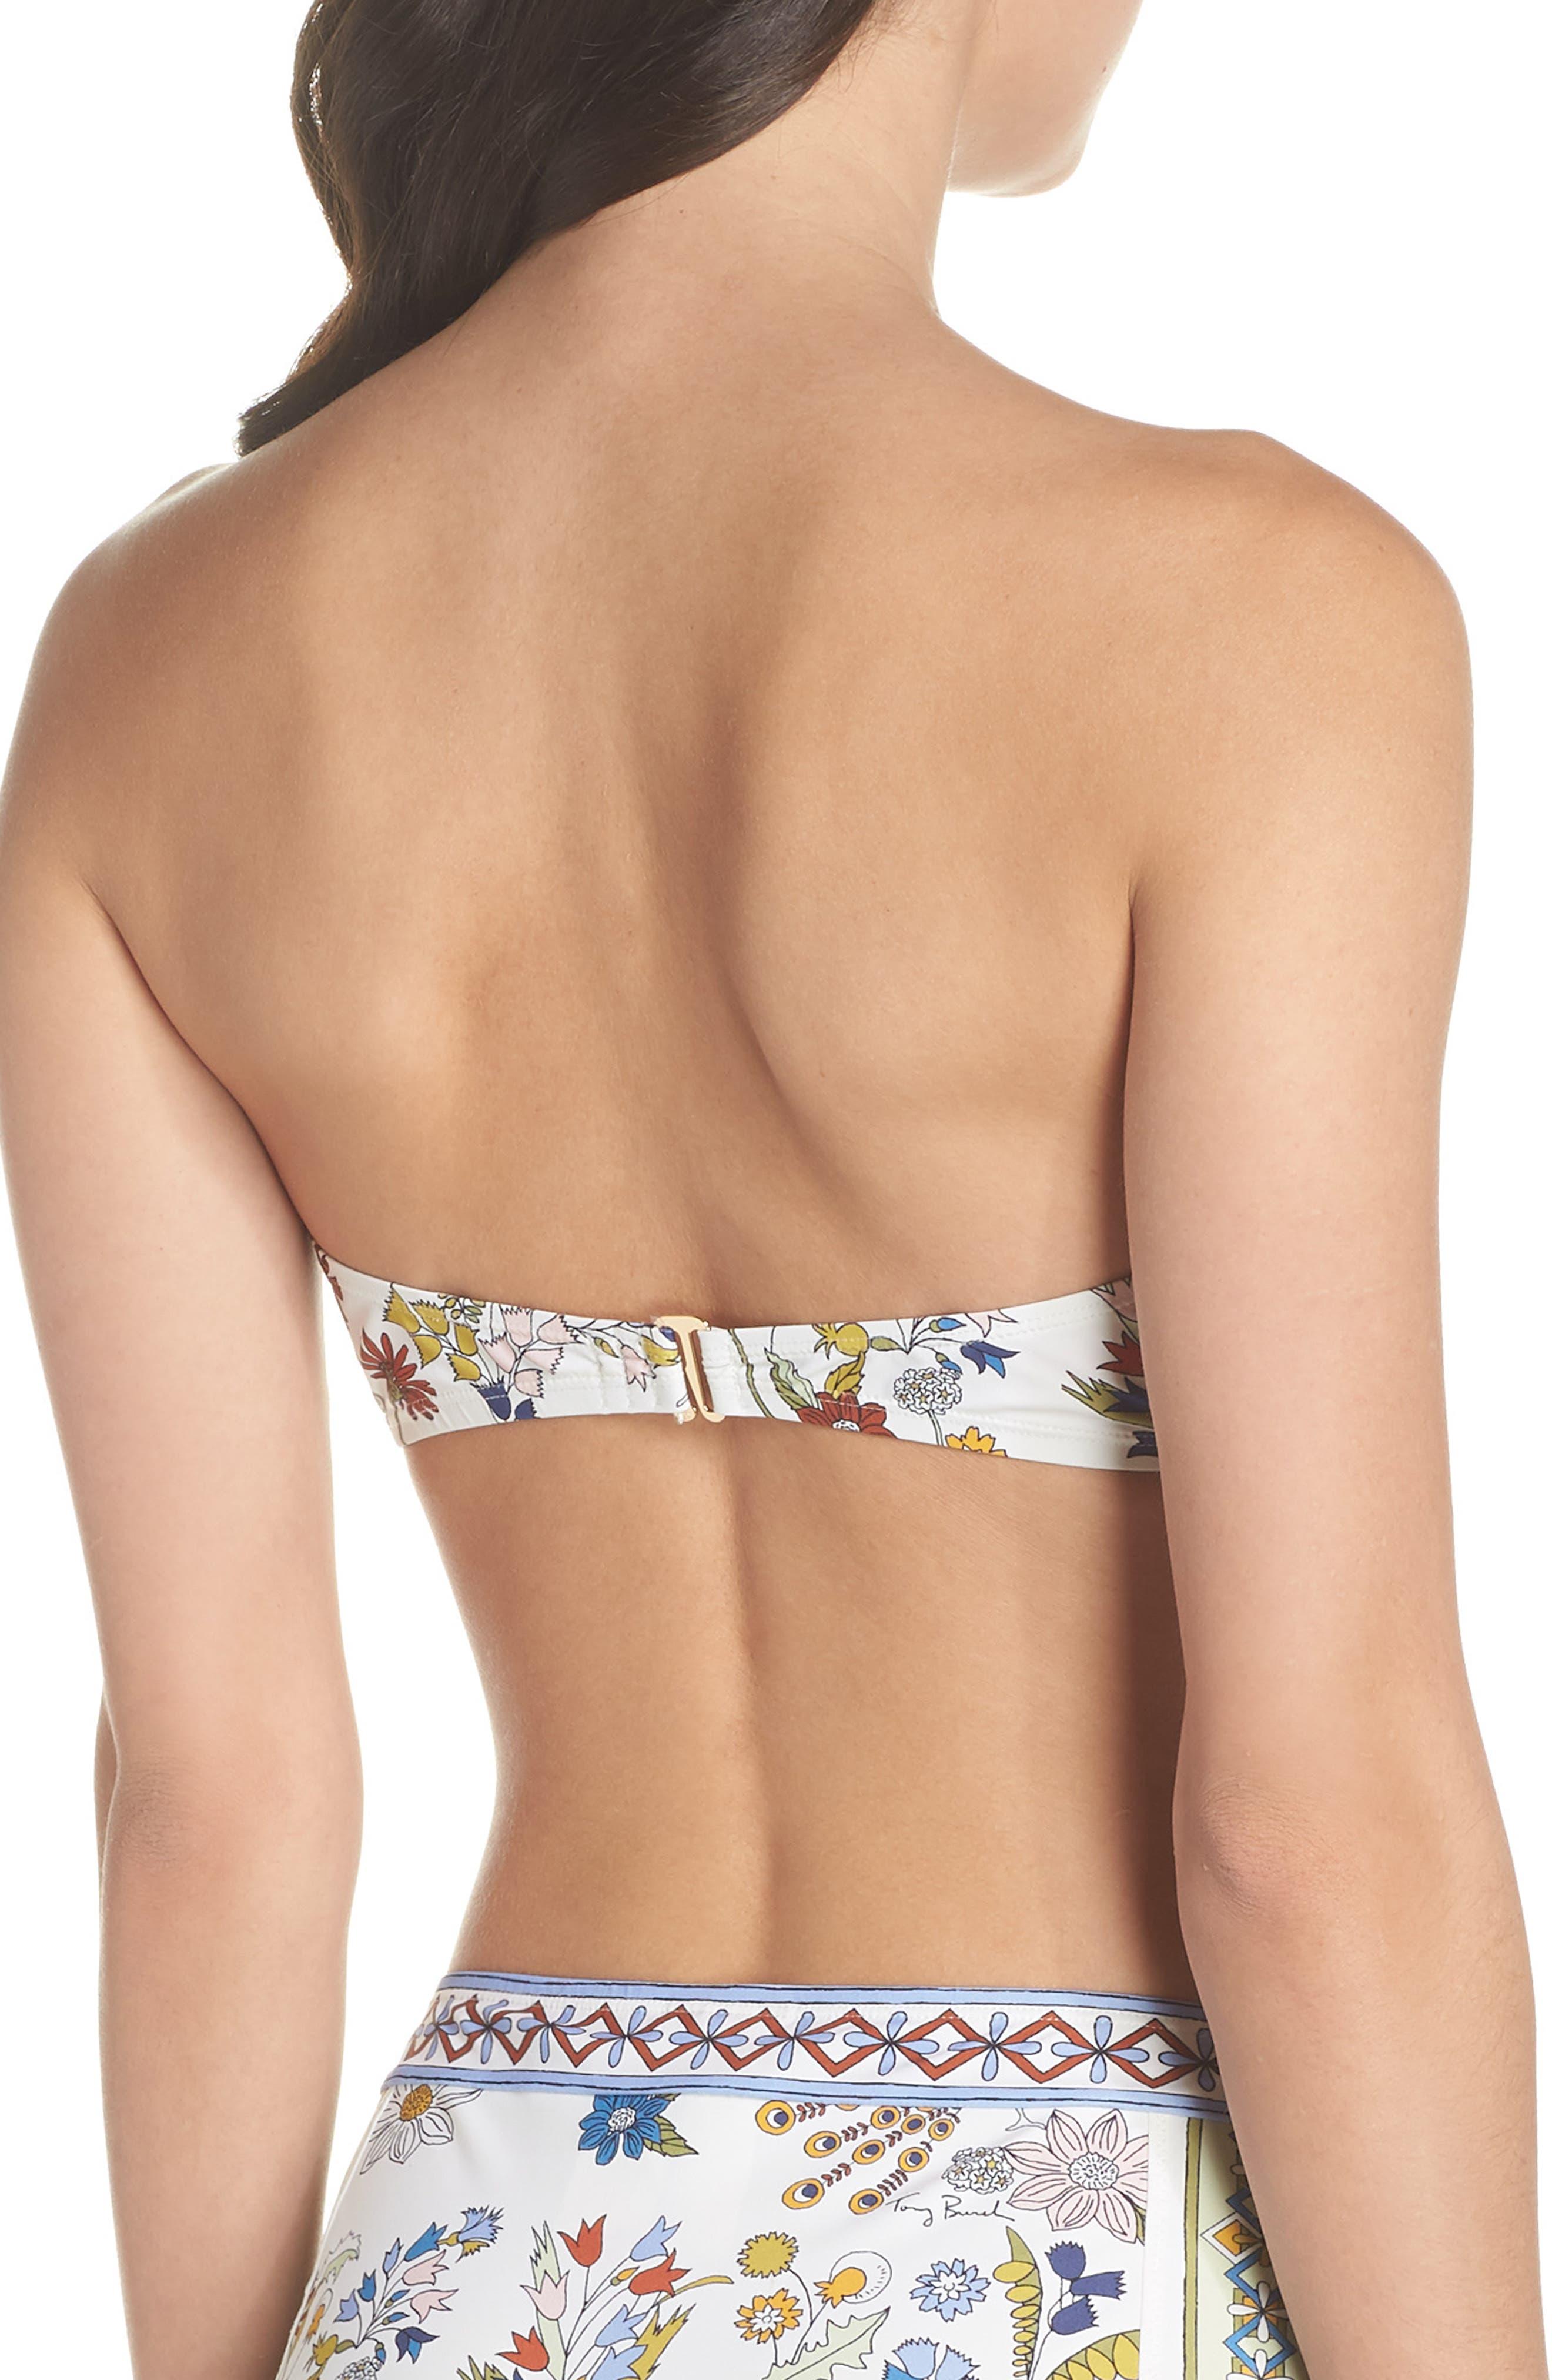 Meadow Folly Bikini Top,                             Alternate thumbnail 2, color,                             Ivory Meadow Folly